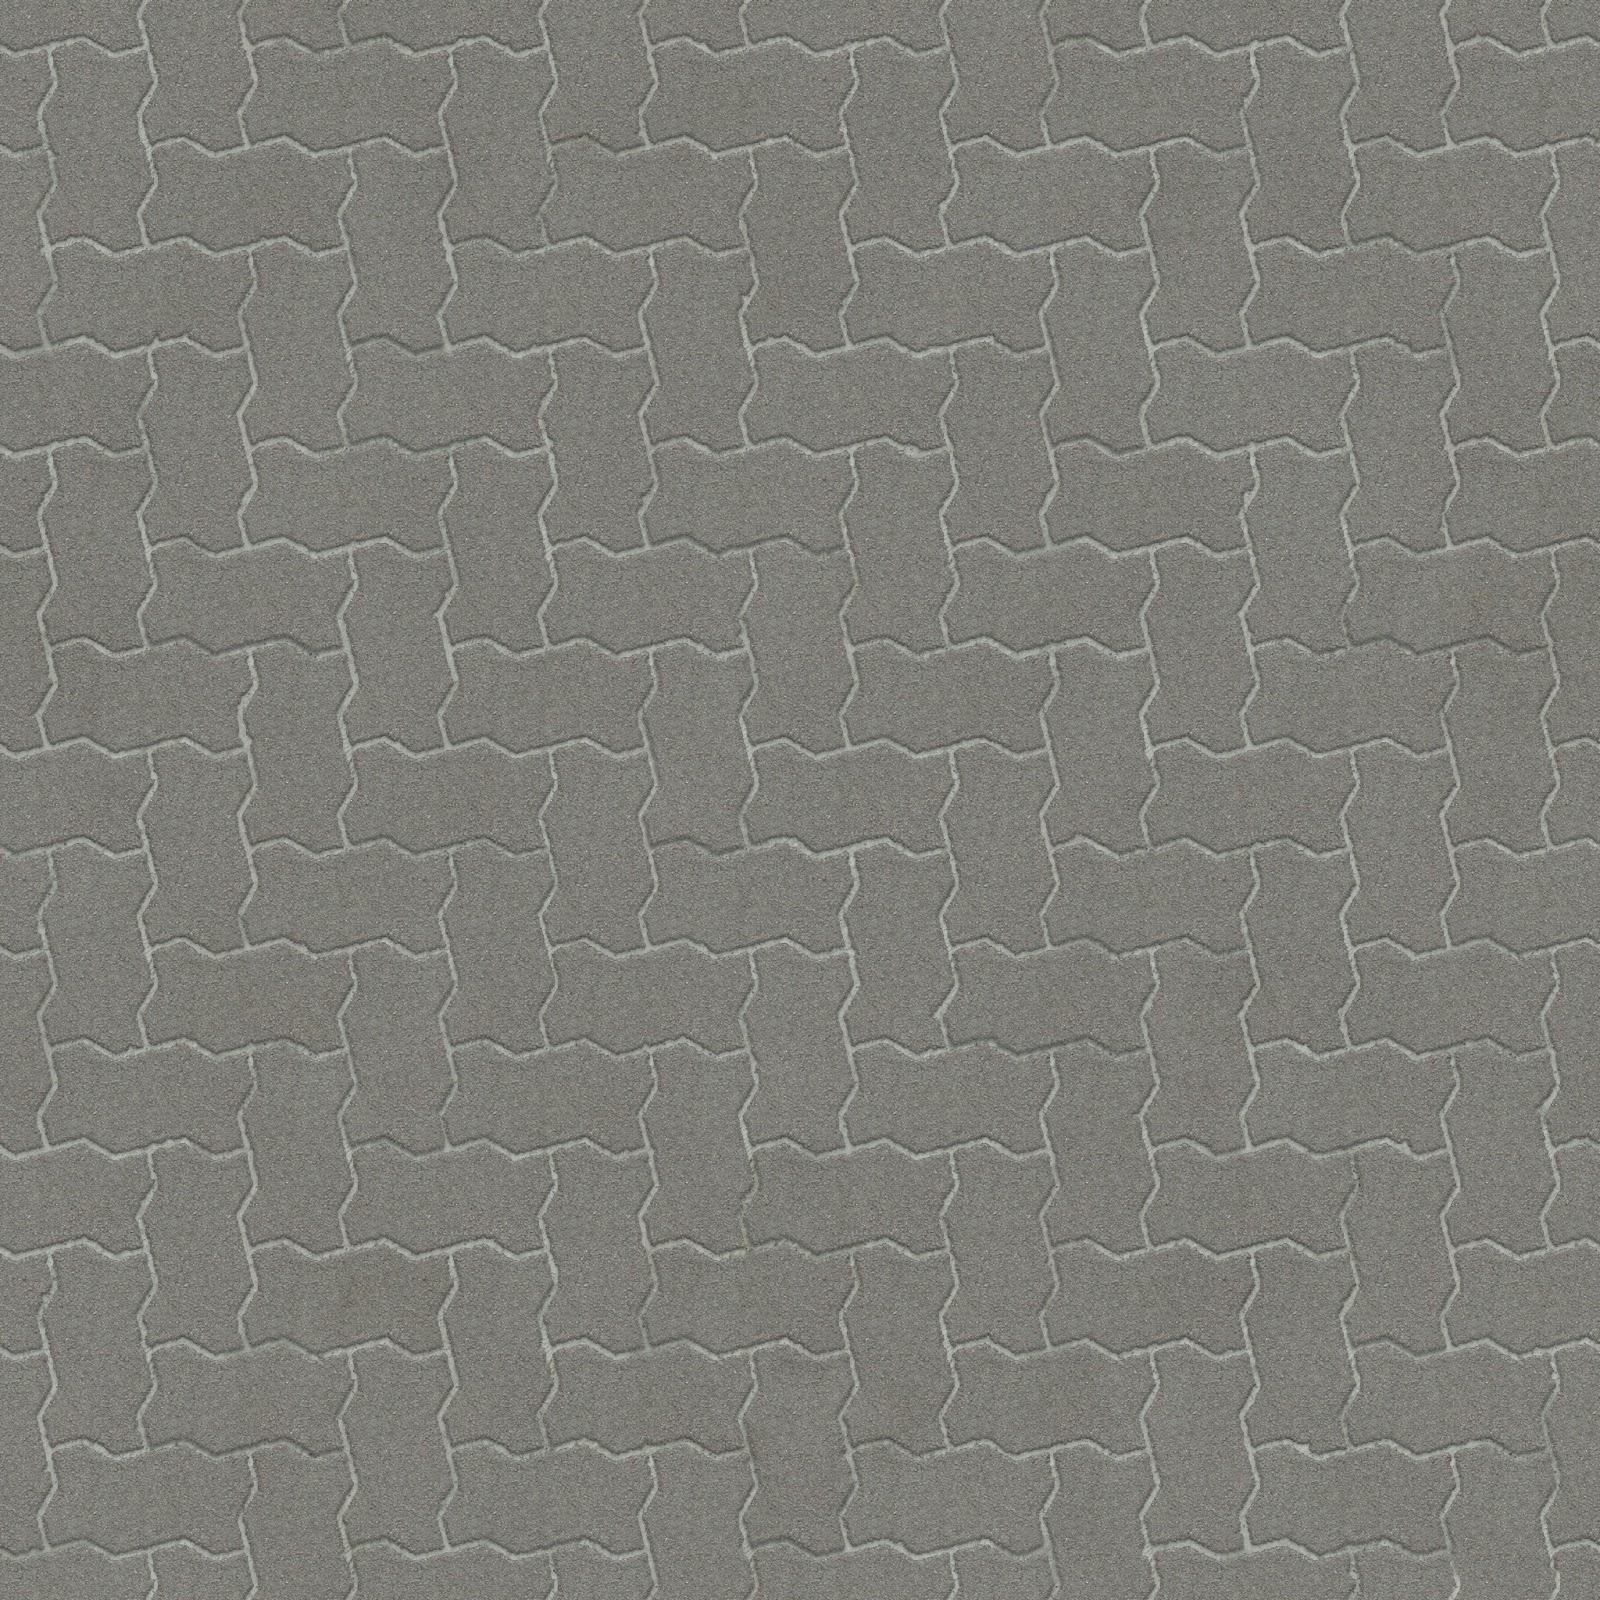 High Resolution Seamless Textures Brick Pavement Clean